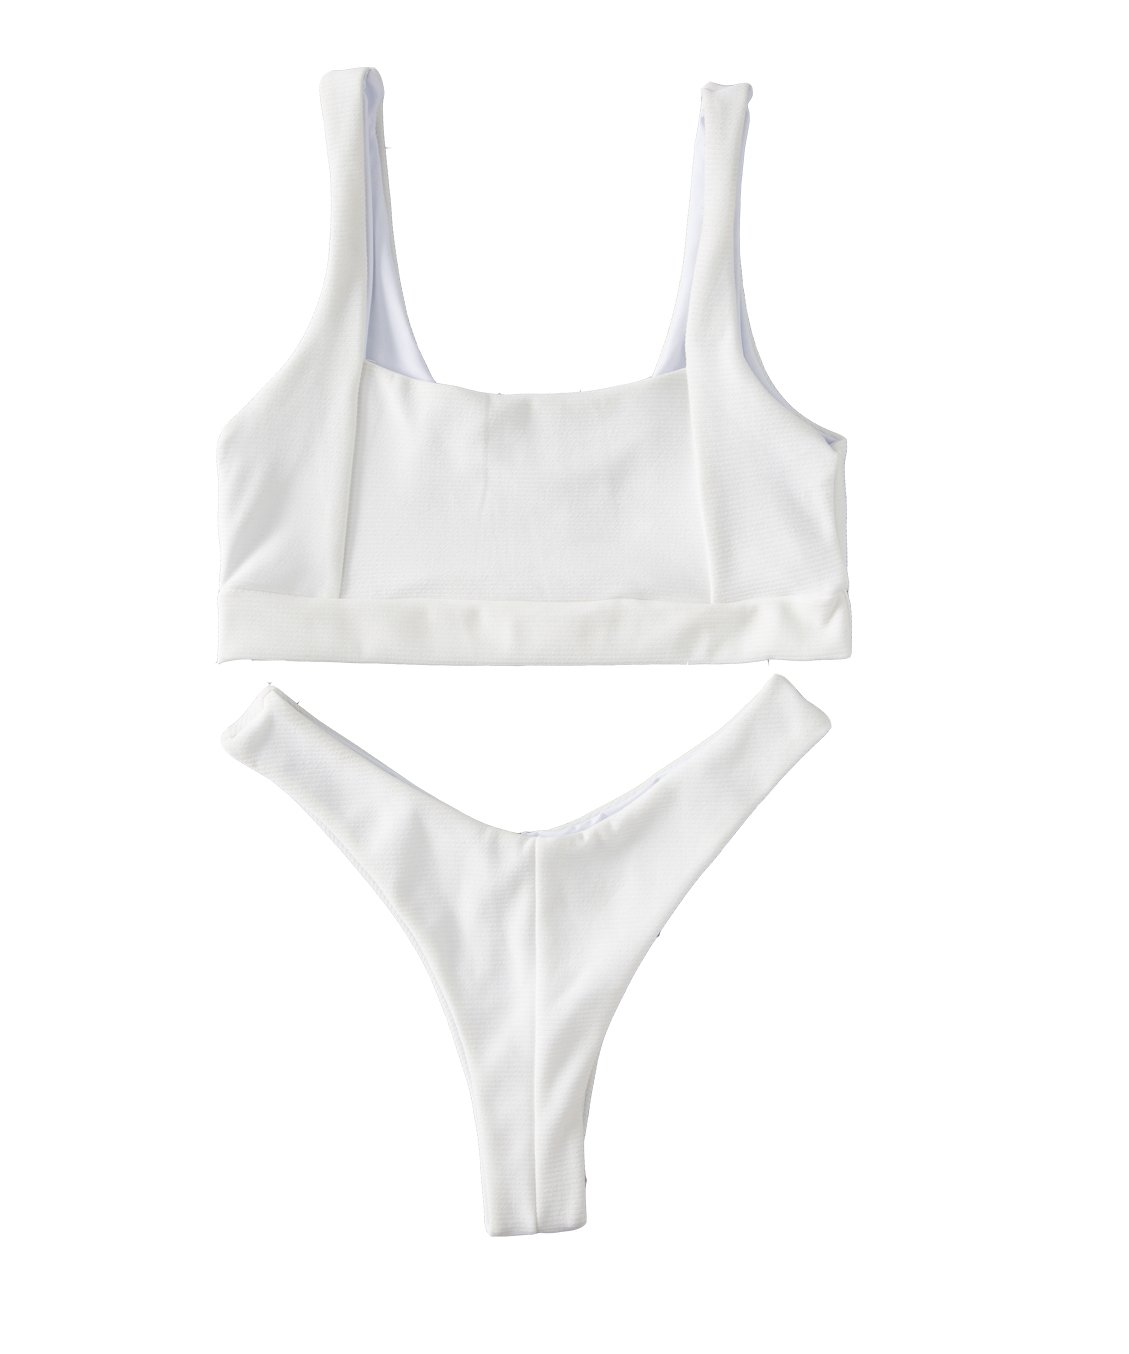 Blugibedramsh SWIMWEAR レディース B07C3Z9S74 Black(bikini Swimsutis) Small